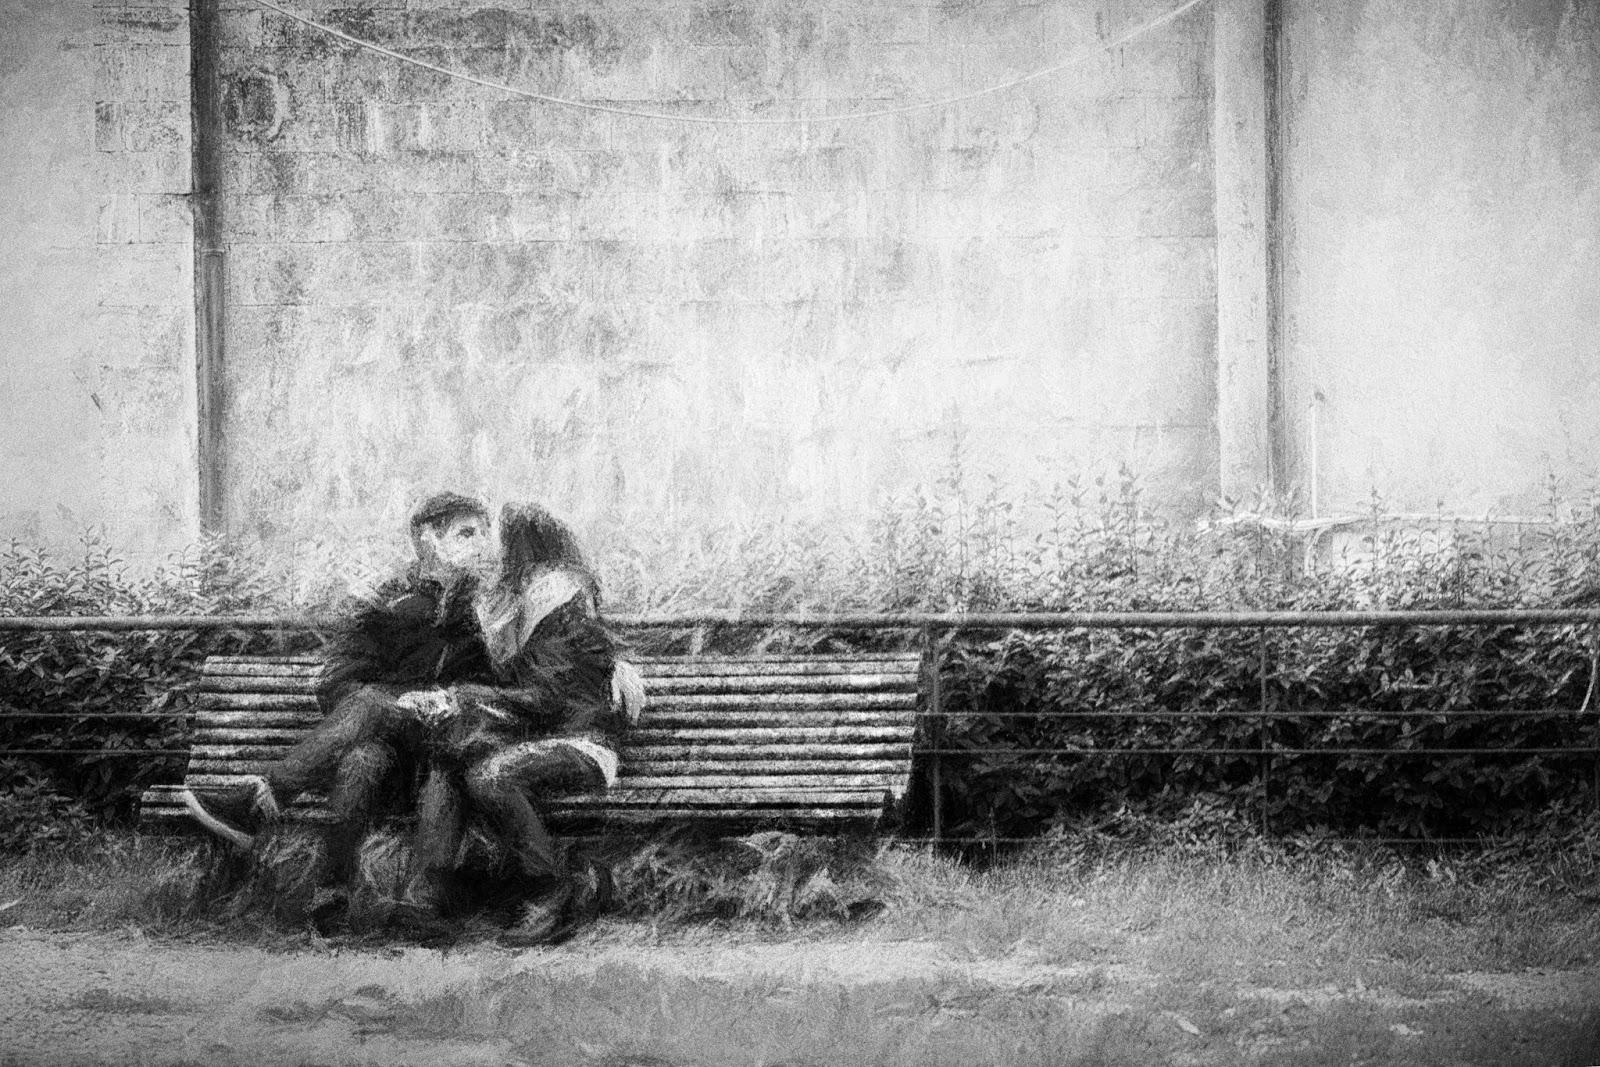 fine art fotografie kiss impressionist street photography. Black Bedroom Furniture Sets. Home Design Ideas